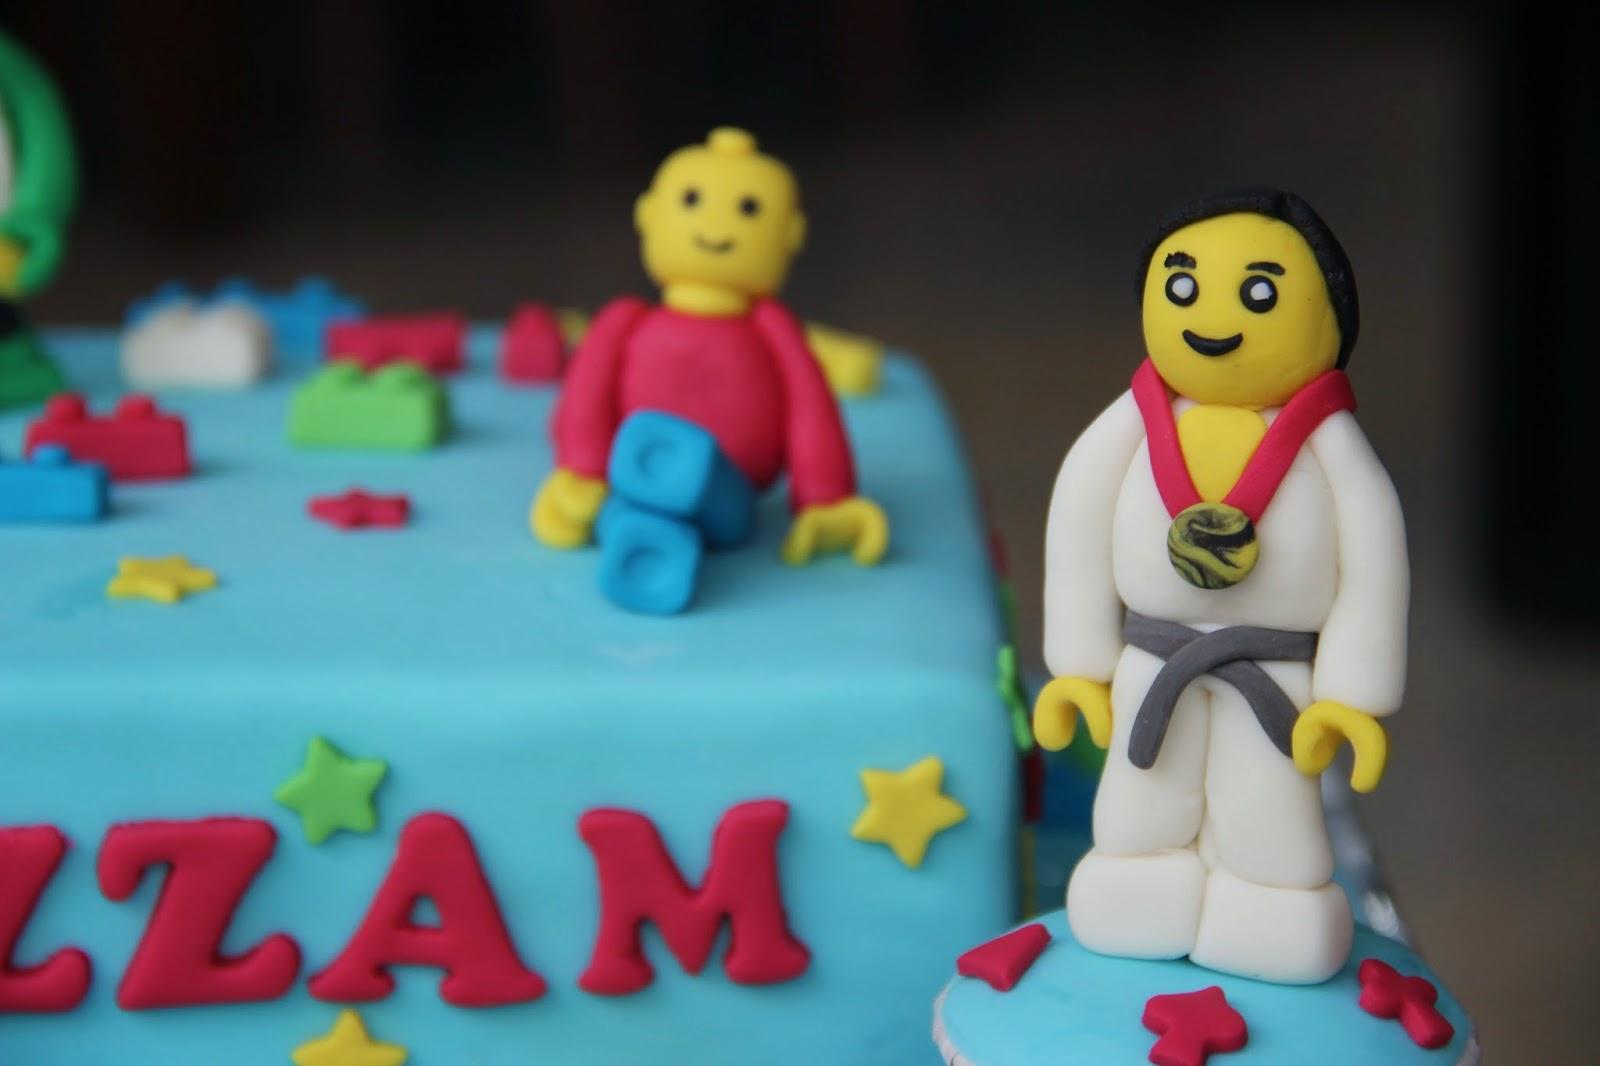 Kue Ratu Kue Lego Figurine Kecil Kecil Ala Lego